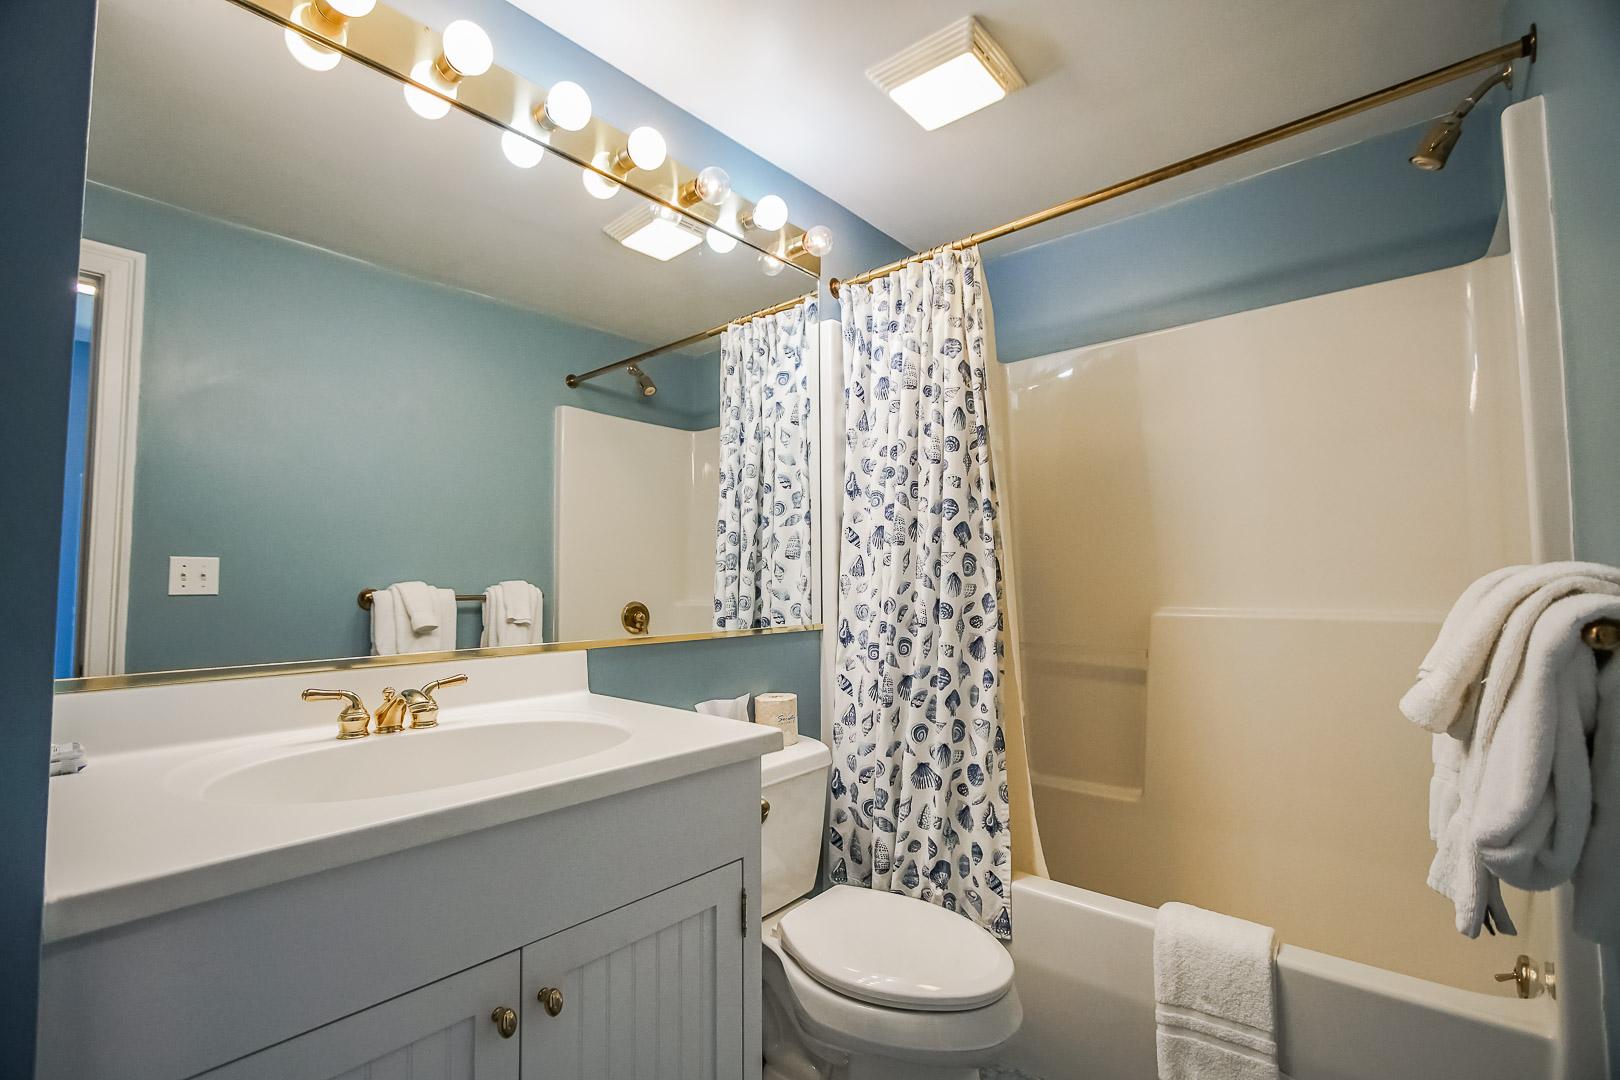 A clean bathroom at VRI's Beachside Village Resort in Massachusetts.